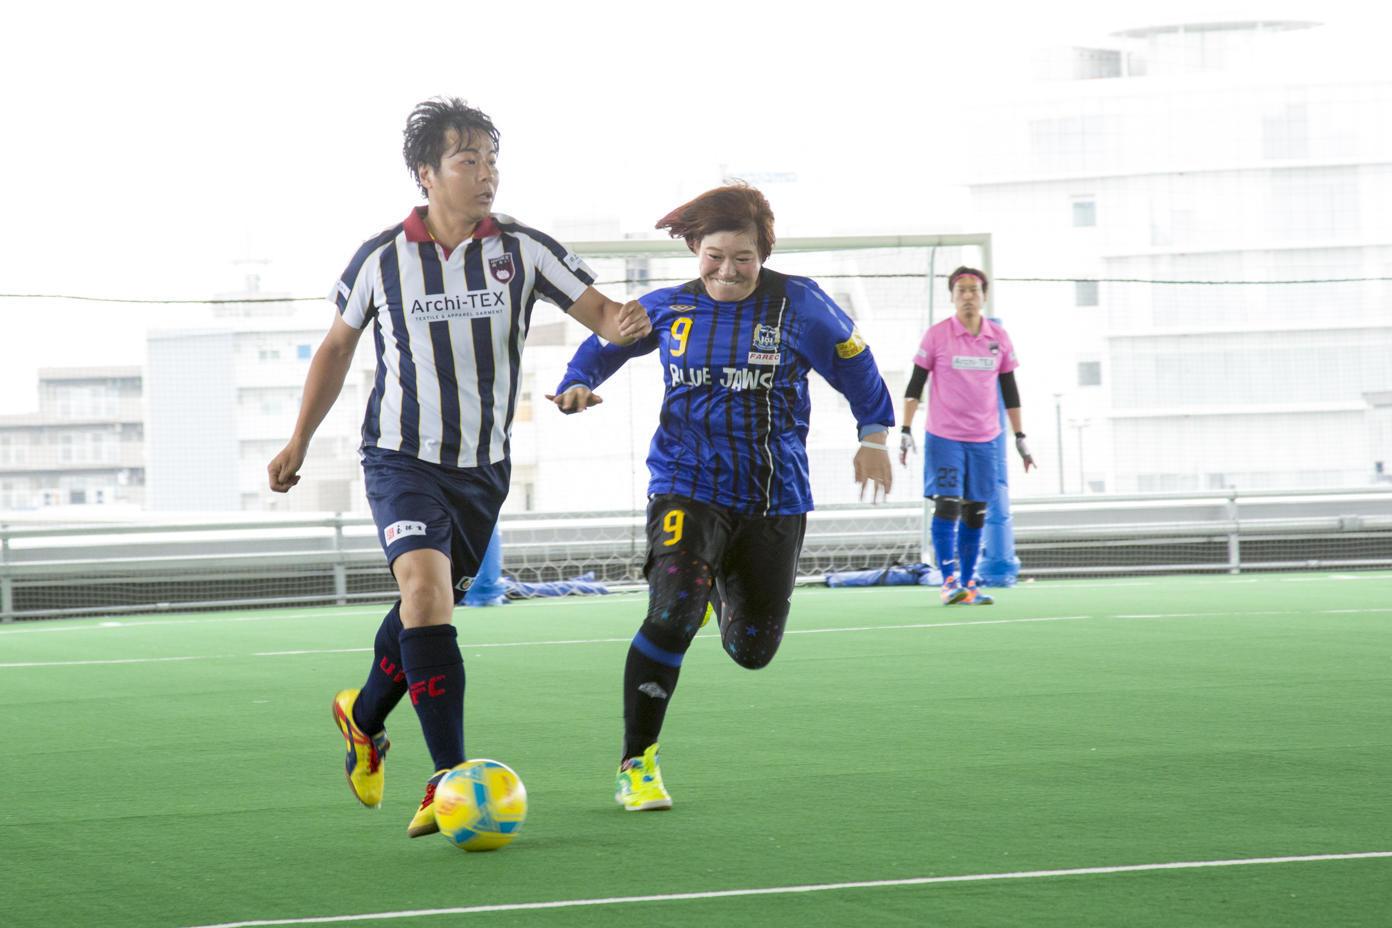 http://news.yoshimoto.co.jp/20170802174355-42a6416769ba70a08ba2199caf39fb13840cde2f.jpg